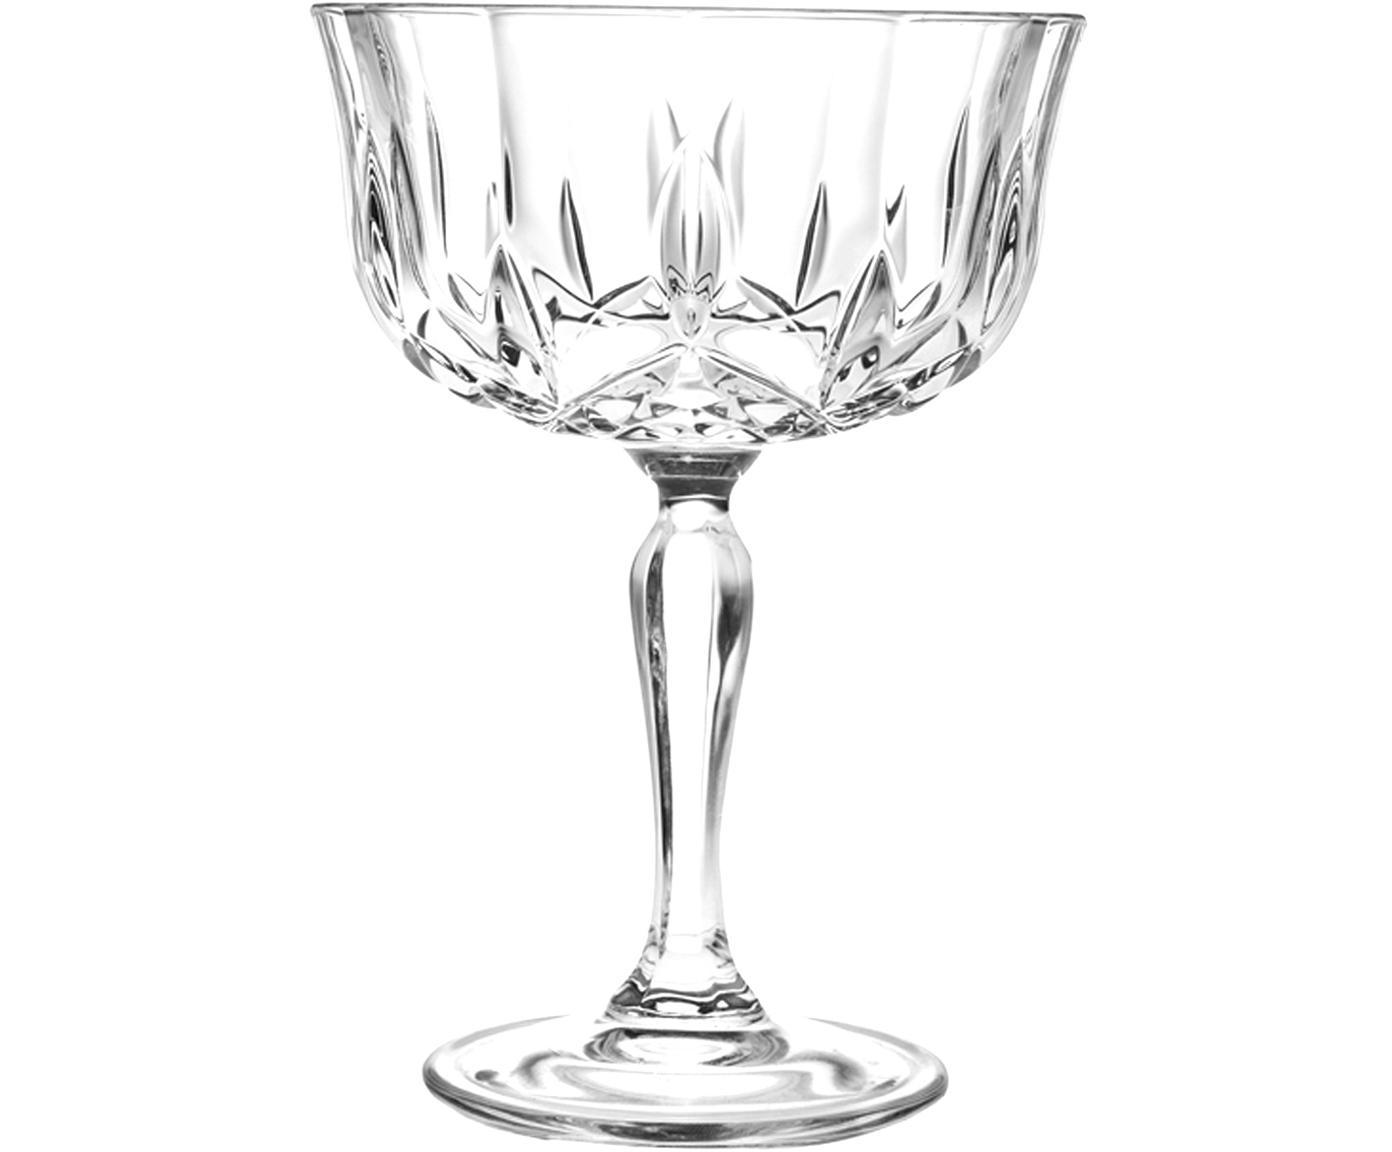 Kristallen champagneglazen Opera, 6 stuks, Luxion-kristalglas, Transparant, Ø 10 x H 14 cm